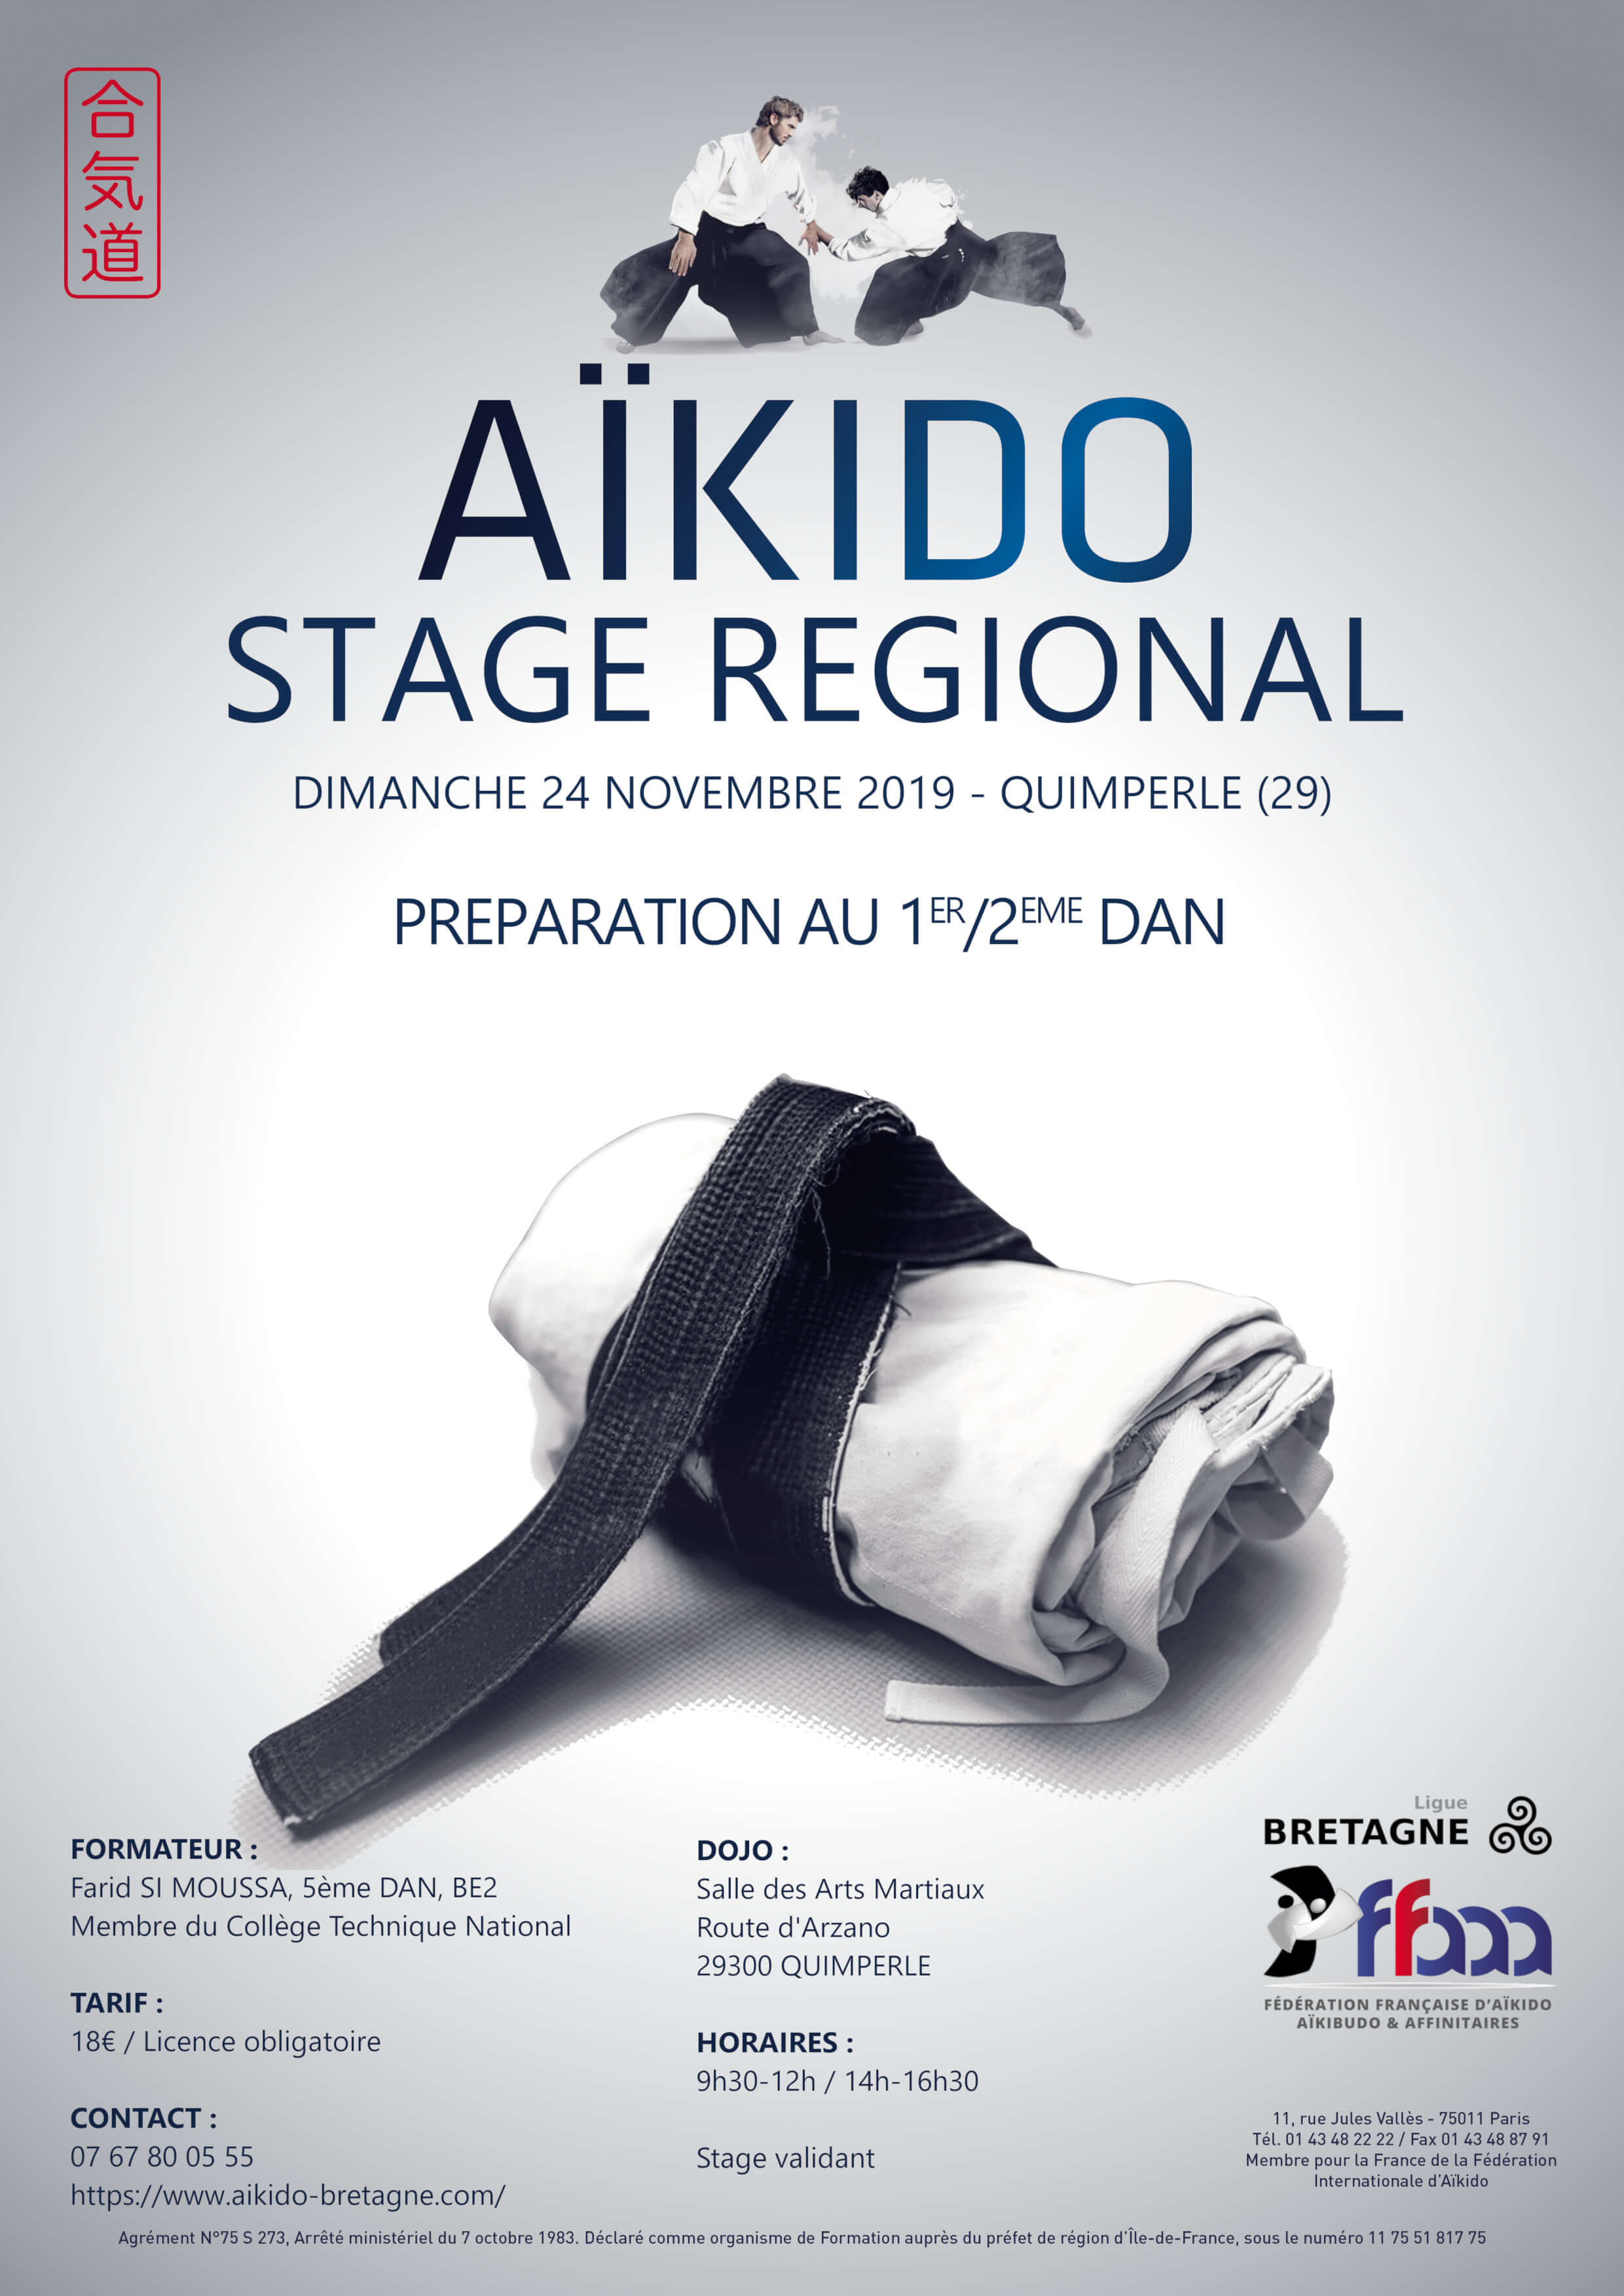 https://www.aikido-bretagne.com/wp-content/uploads/2019/10/Affiche-Stage-prepa-1-2-Dan-24-nov-2019-Quimperle-A4-comp